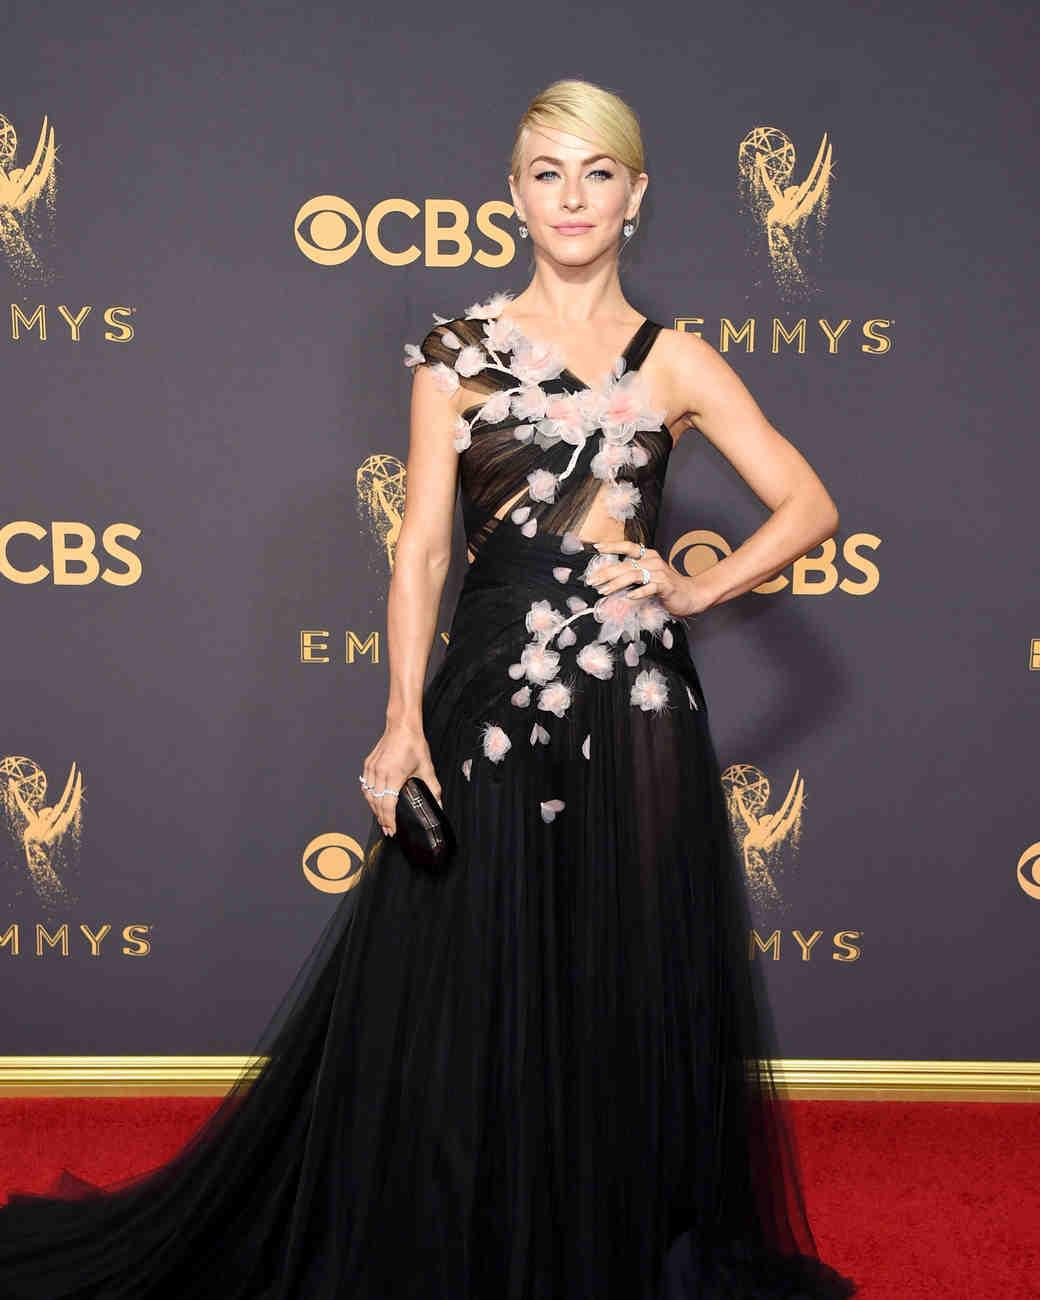 Julianne Hough Emmys Red Carpet 2017